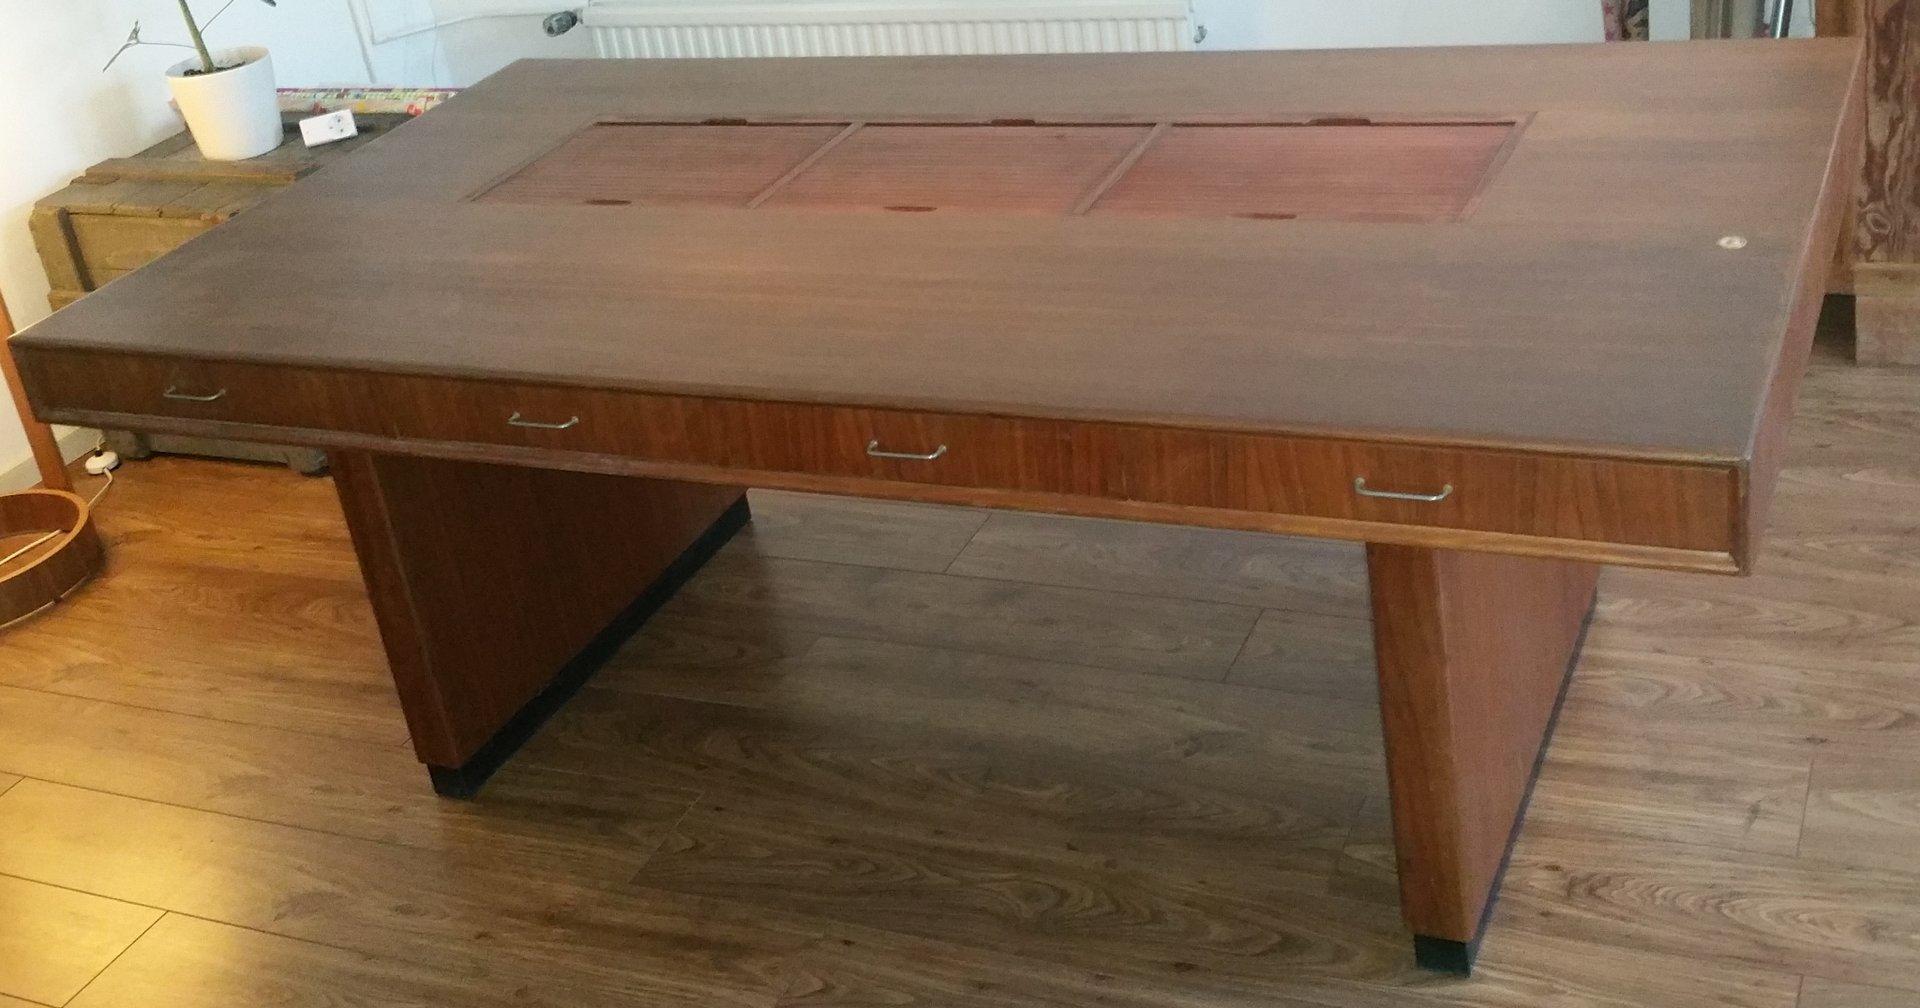 Architect Desk norwegian architect deskclausen & maerus, 1950s for sale at pamono